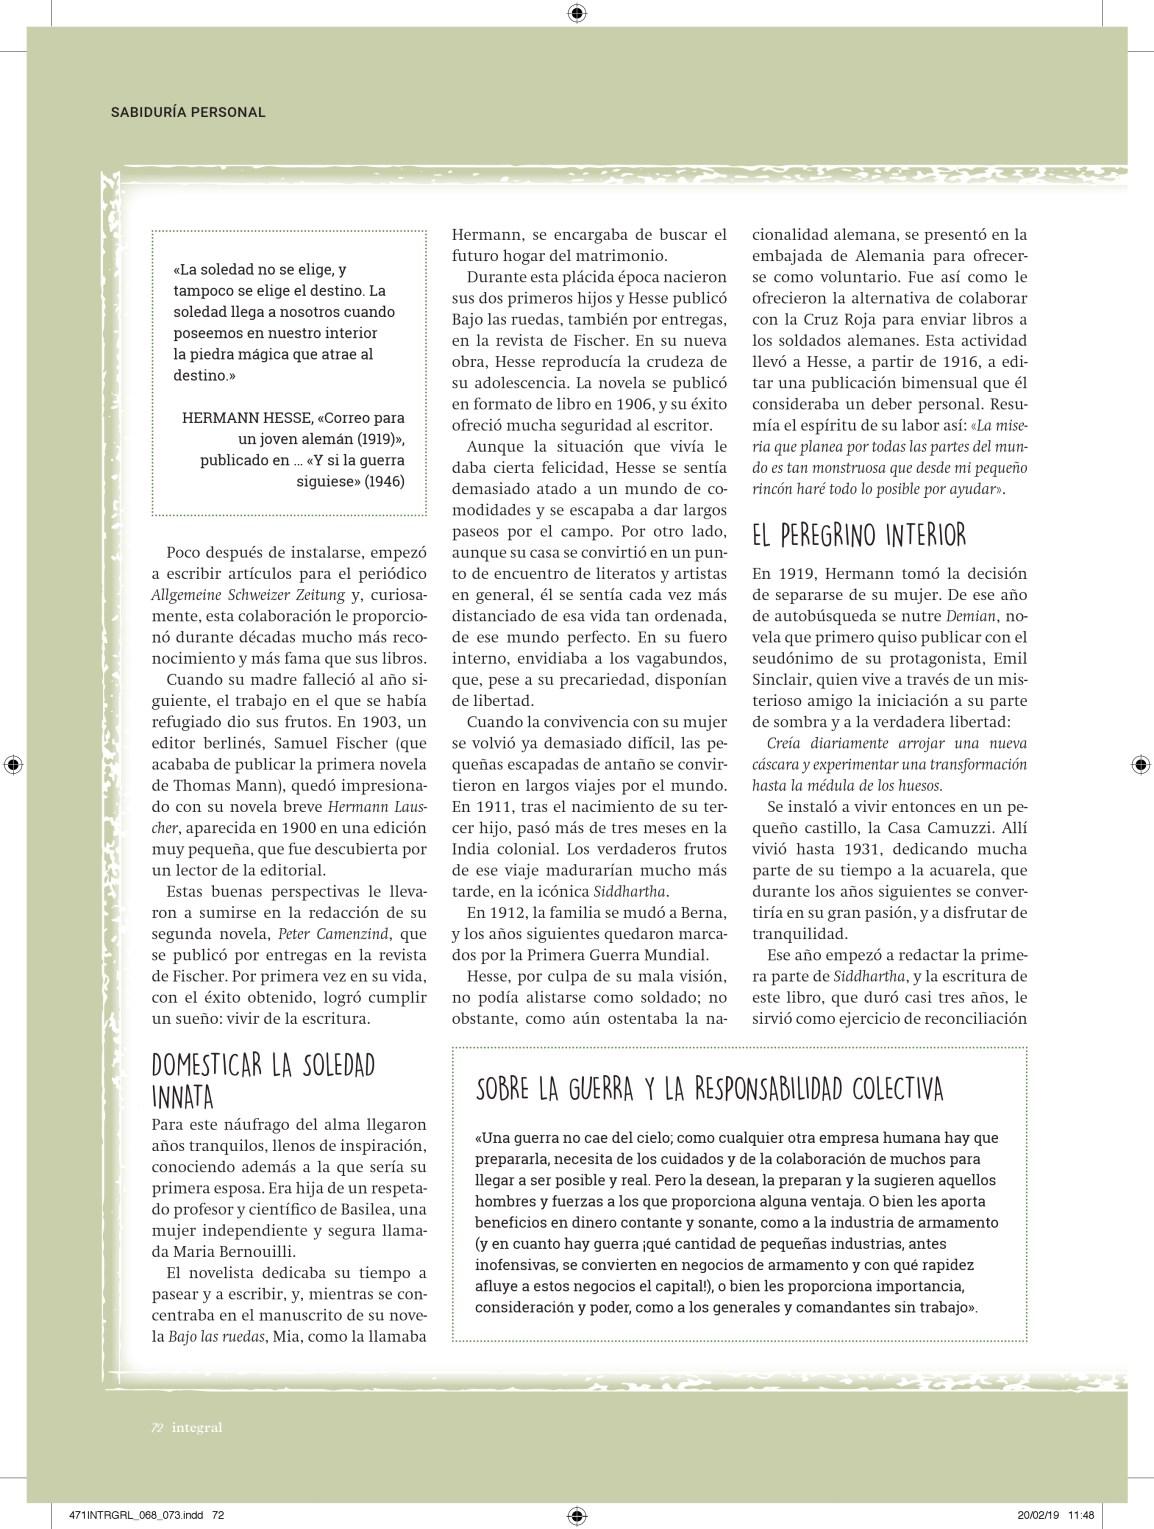 471INTRGRL_068_073_Hesse_Jardinero del Alma_000005